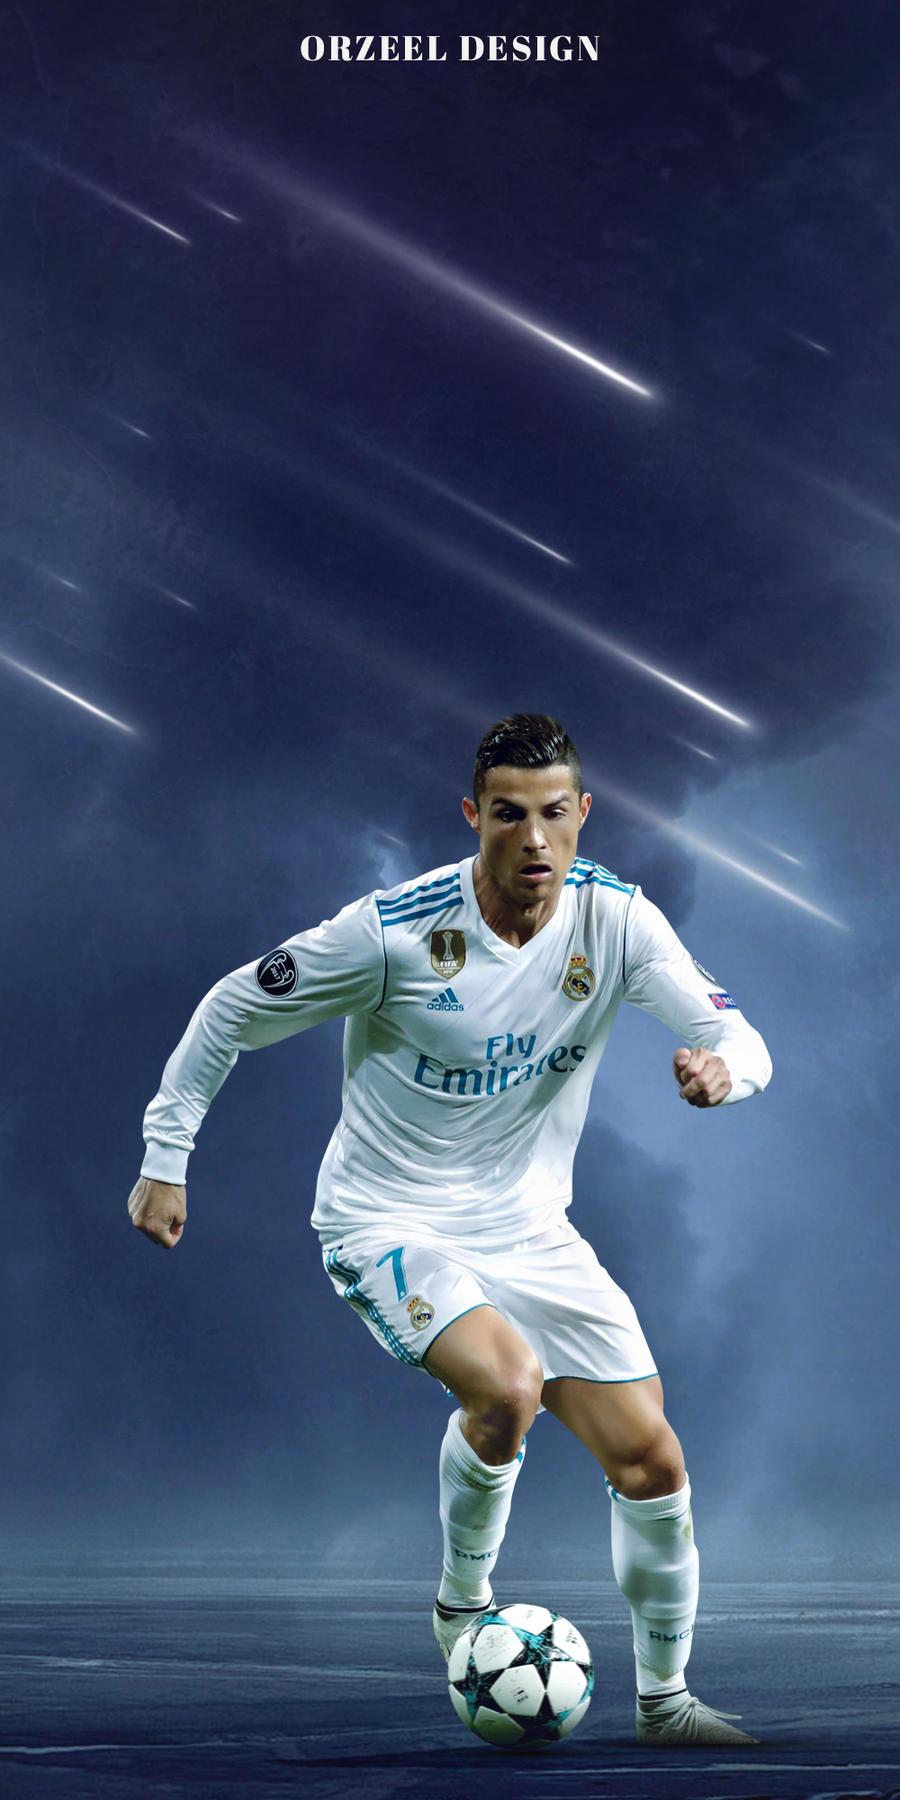 Cristiano Ronaldo Wallpaper Real Madrid By Orrrsell On Deviantart